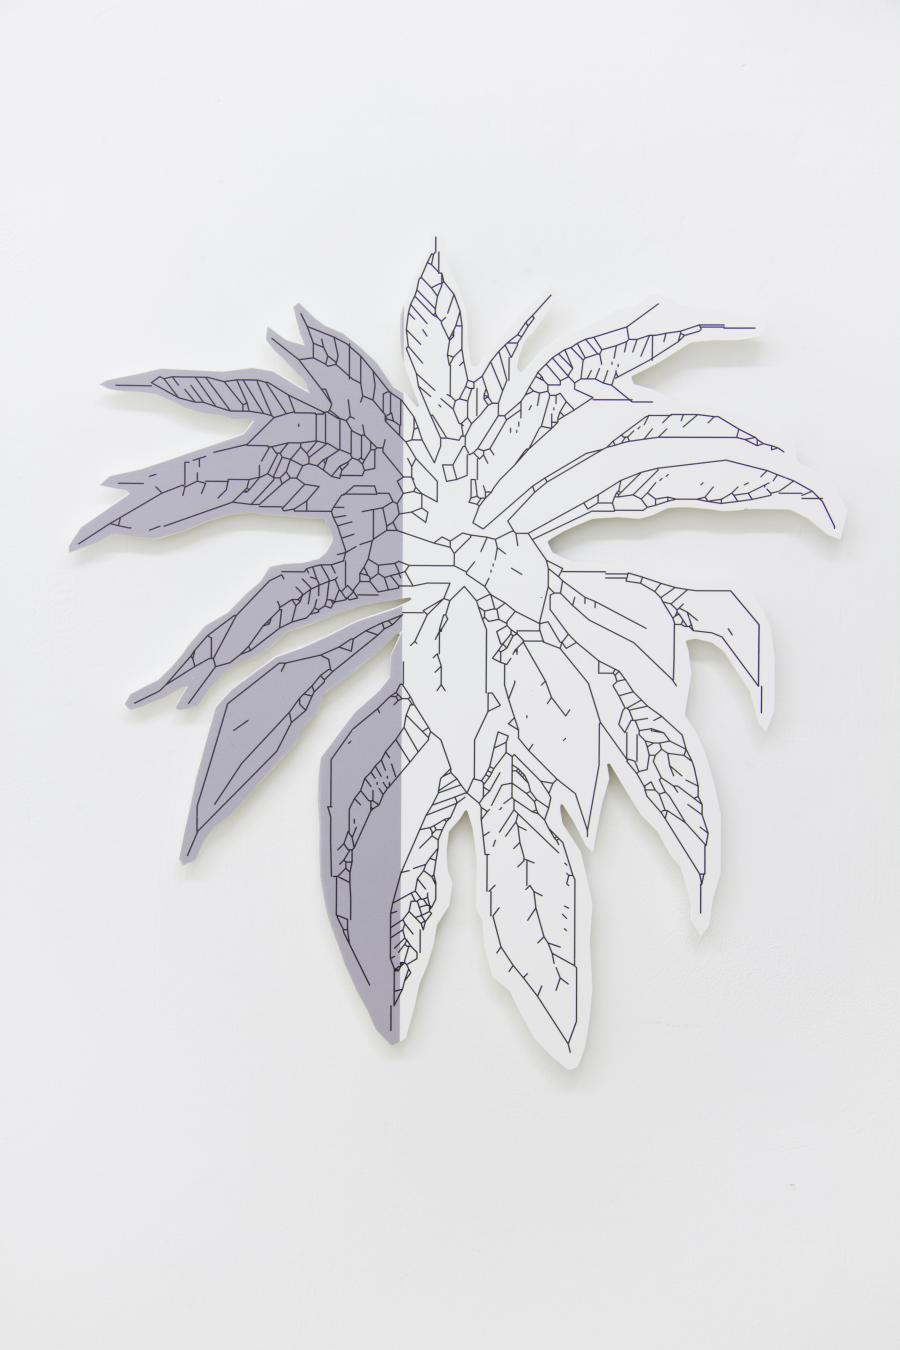 Richard Nikl, Plant (grey), UV-print on PVC, 72 x 77 cm, 2015